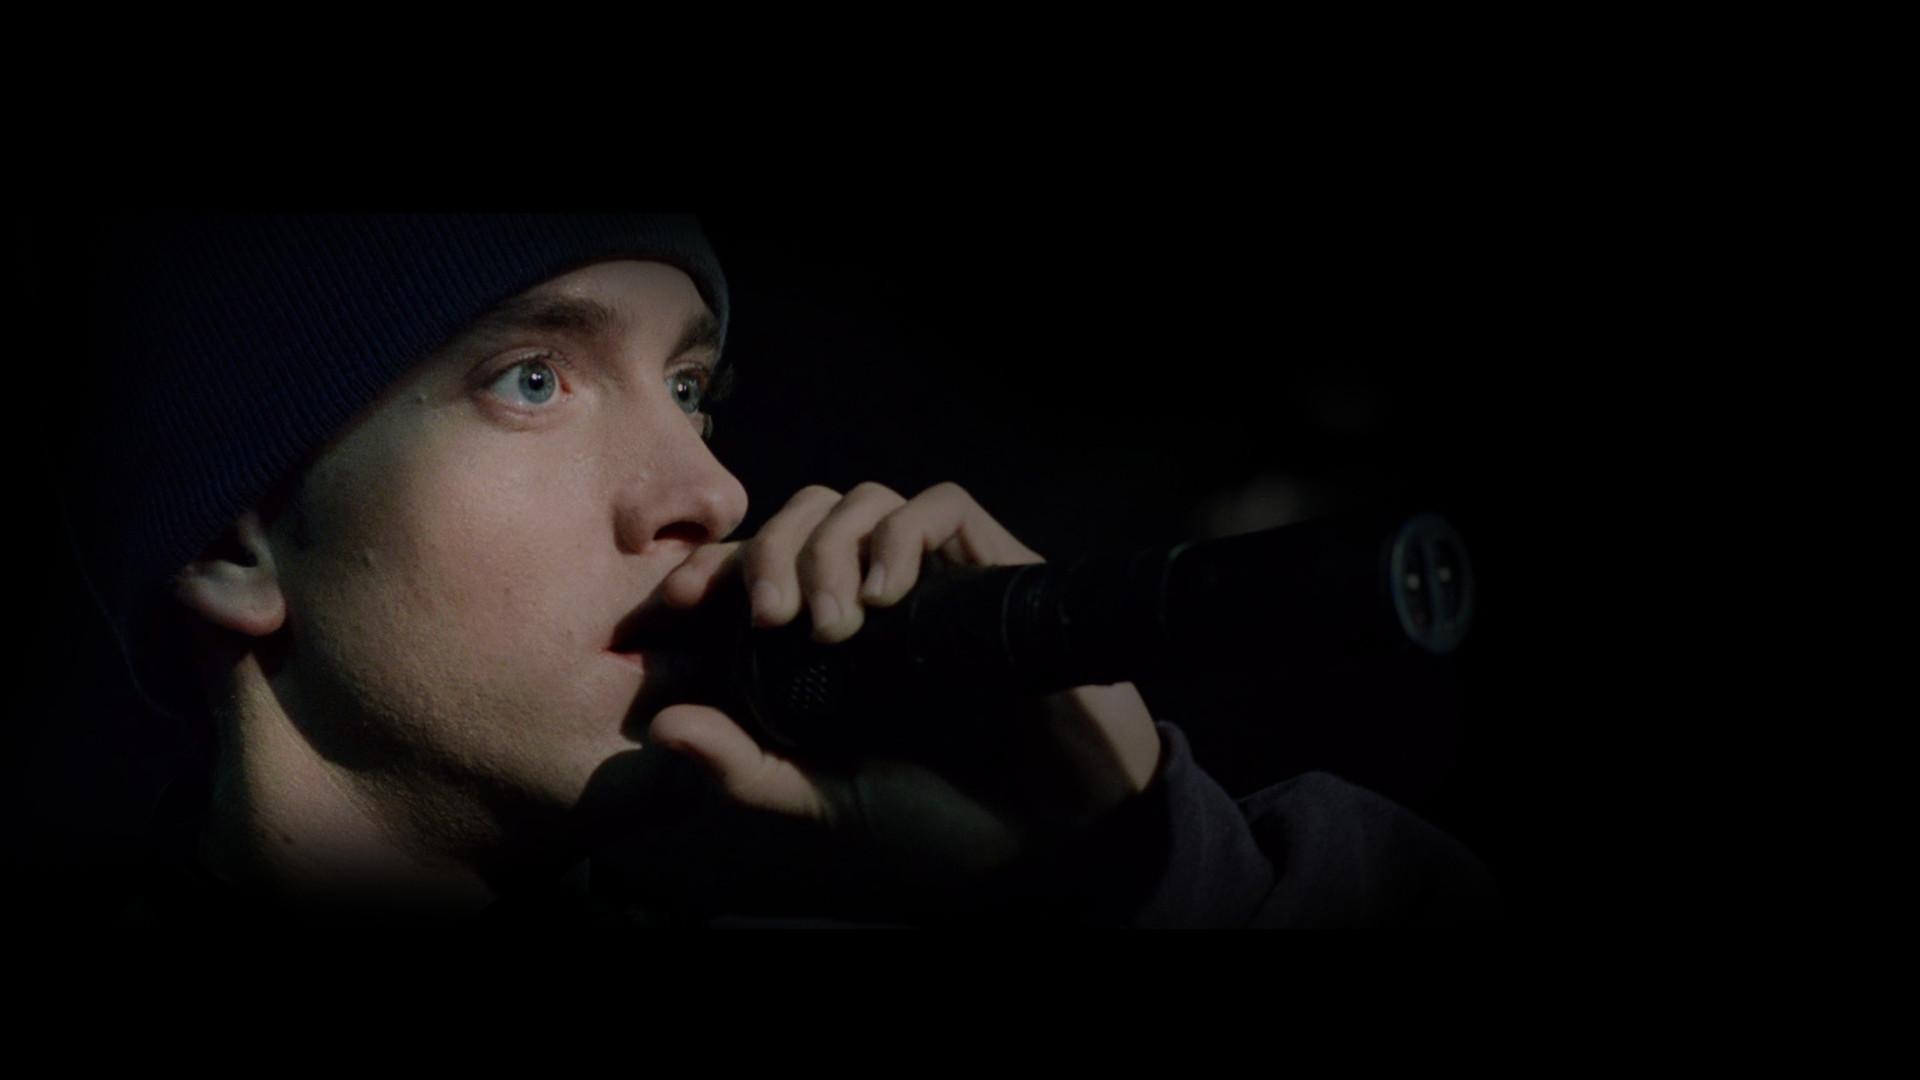 Eminem Wallpaper Iphone 5 Eminem Wallpaper 80 Immagini